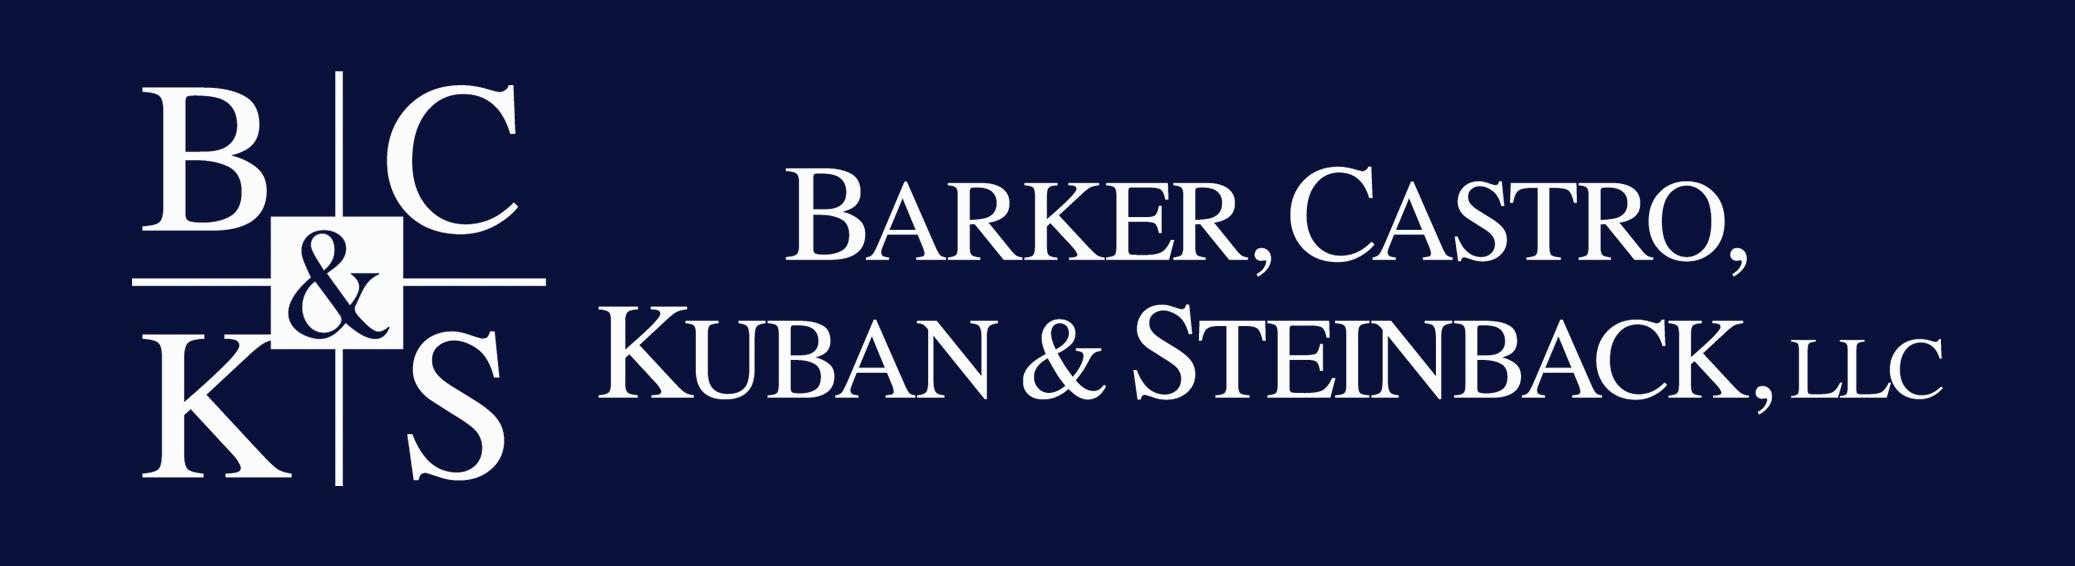 Barker Castro Kuban Steinback